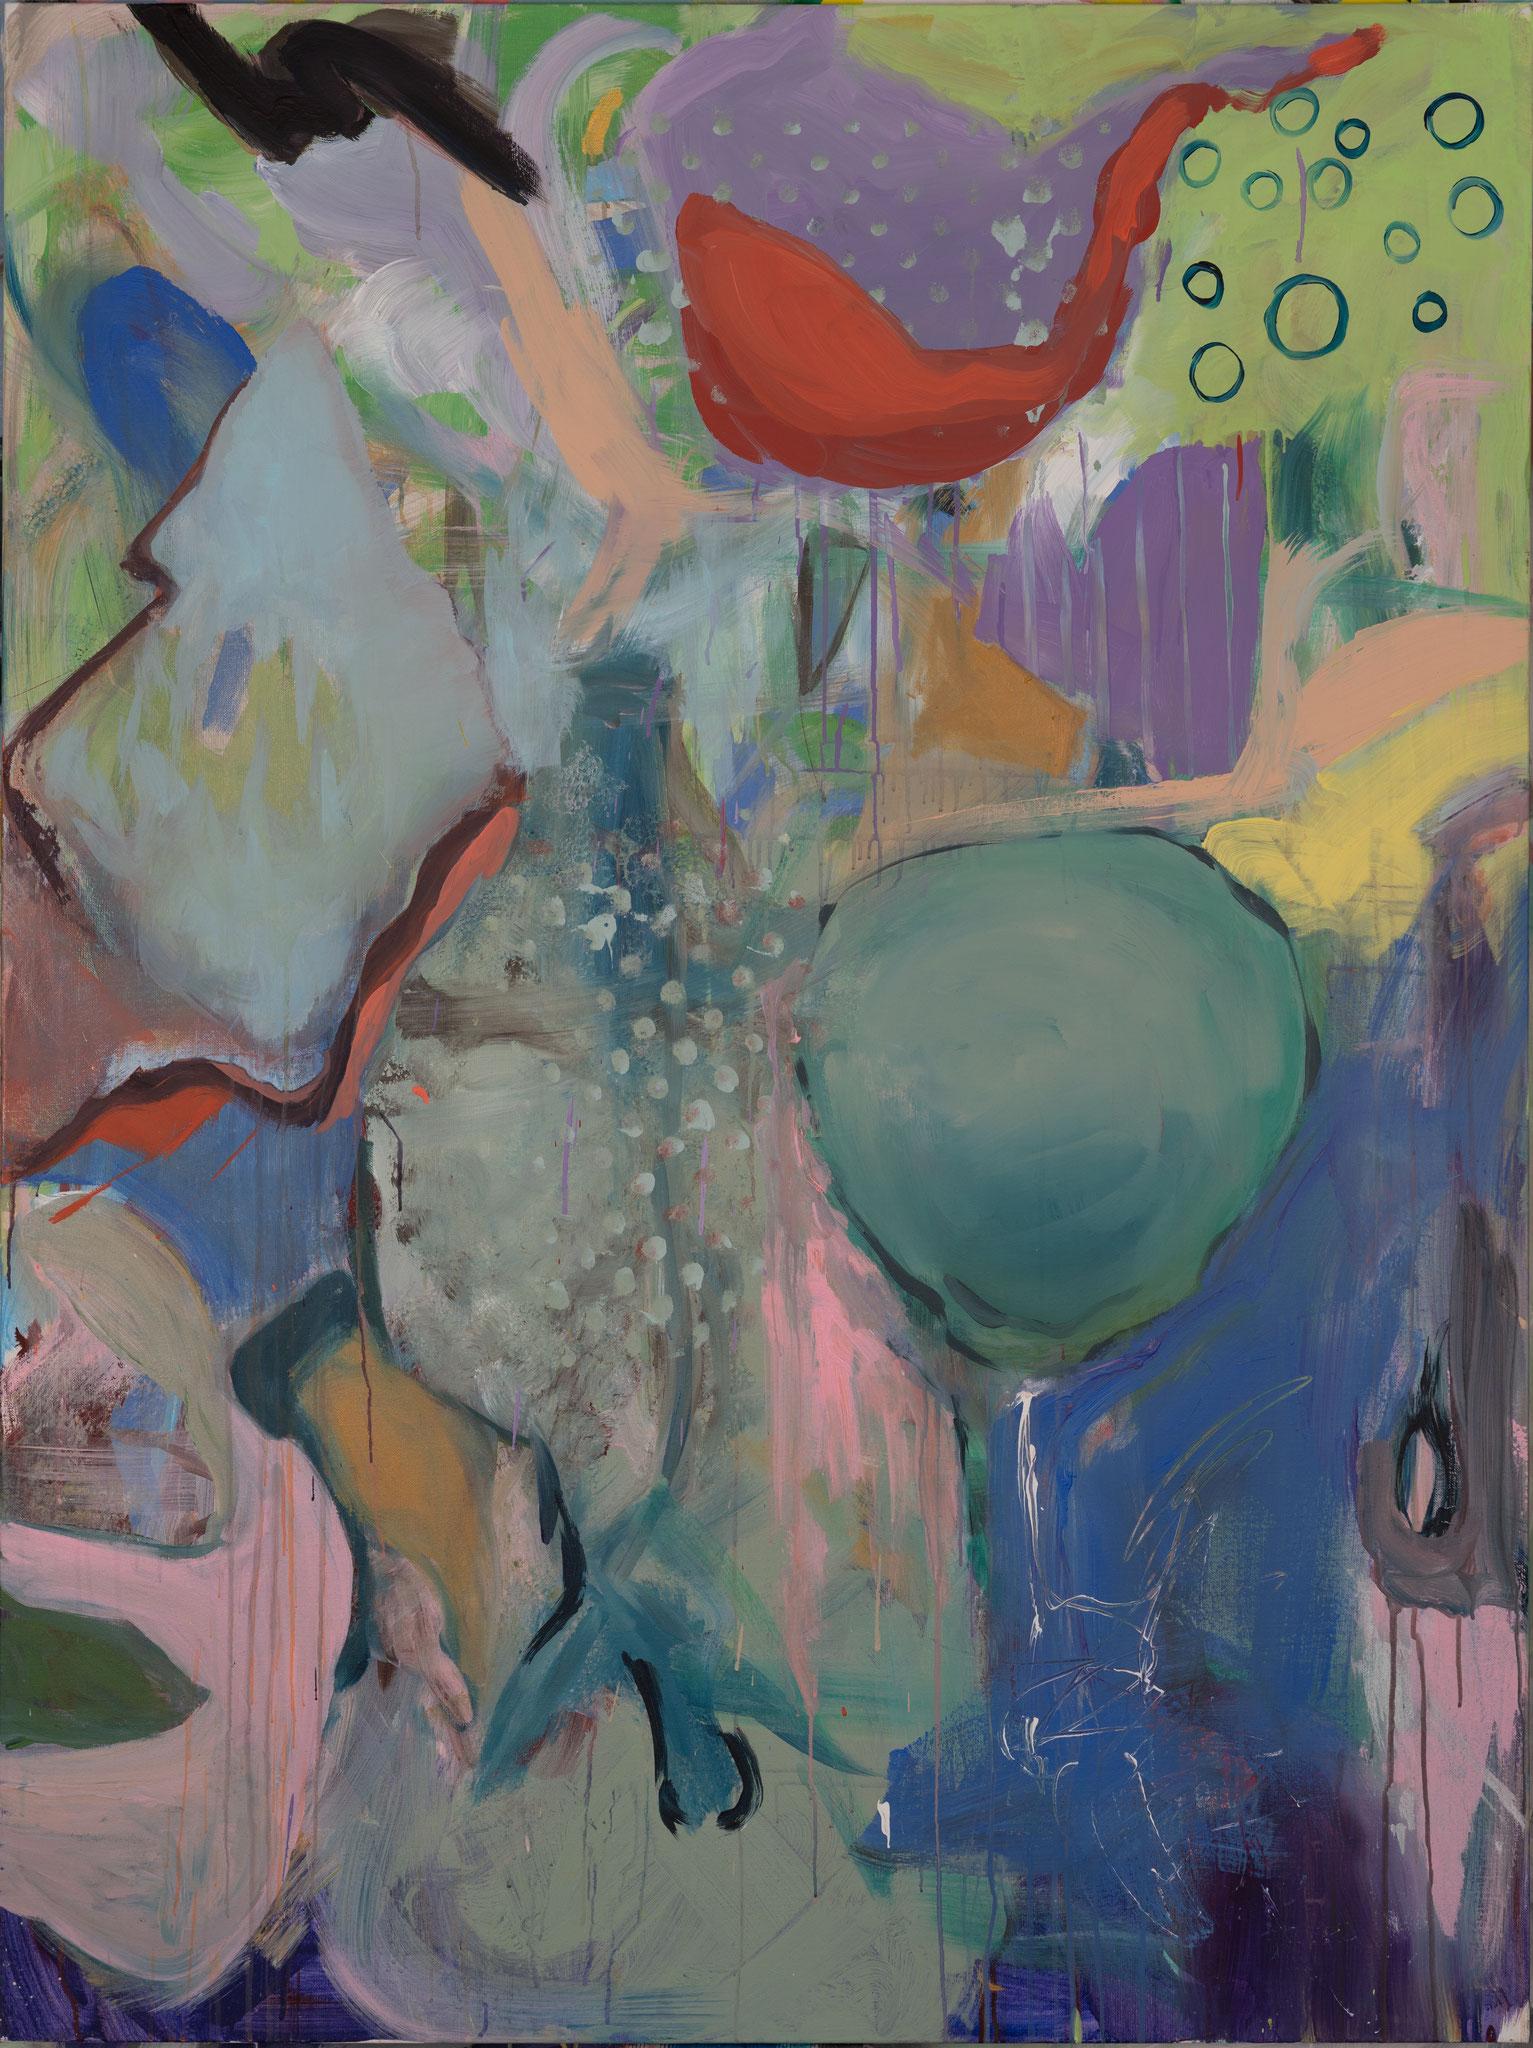 """Red Bird"" 160 x 120 cm - Acryl auf Leinwand"